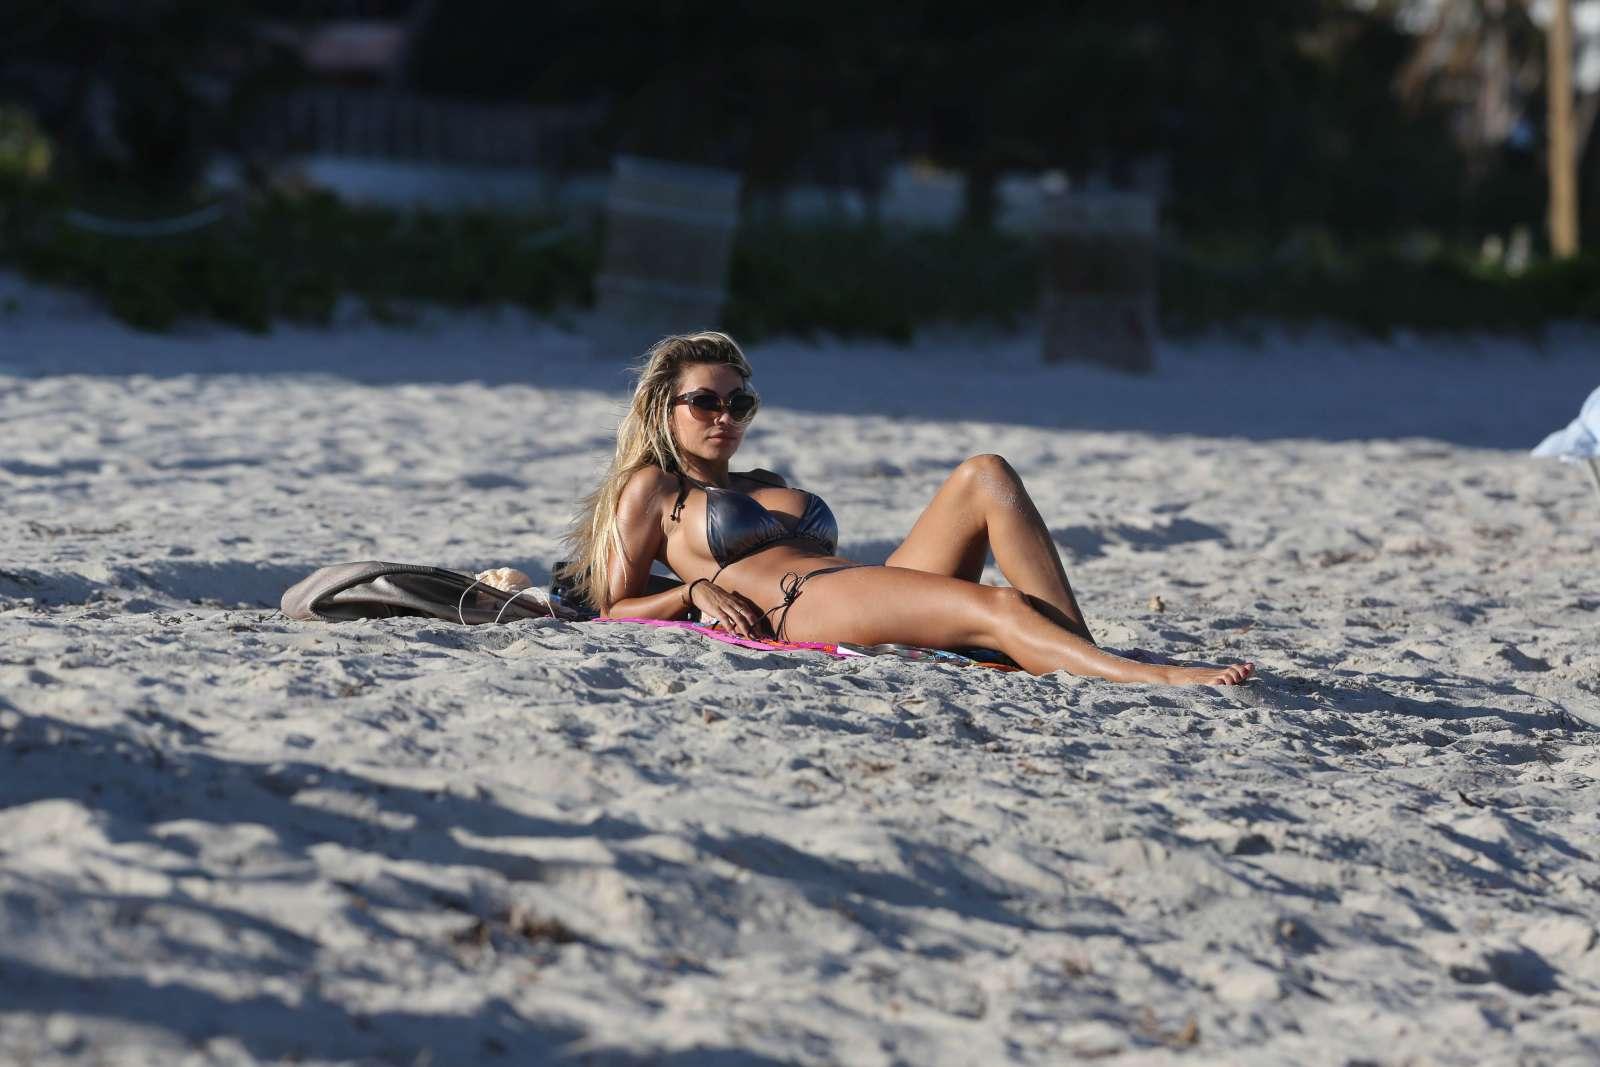 Maria Hering 2017 : Maria Hering in Bikini 2017 -27